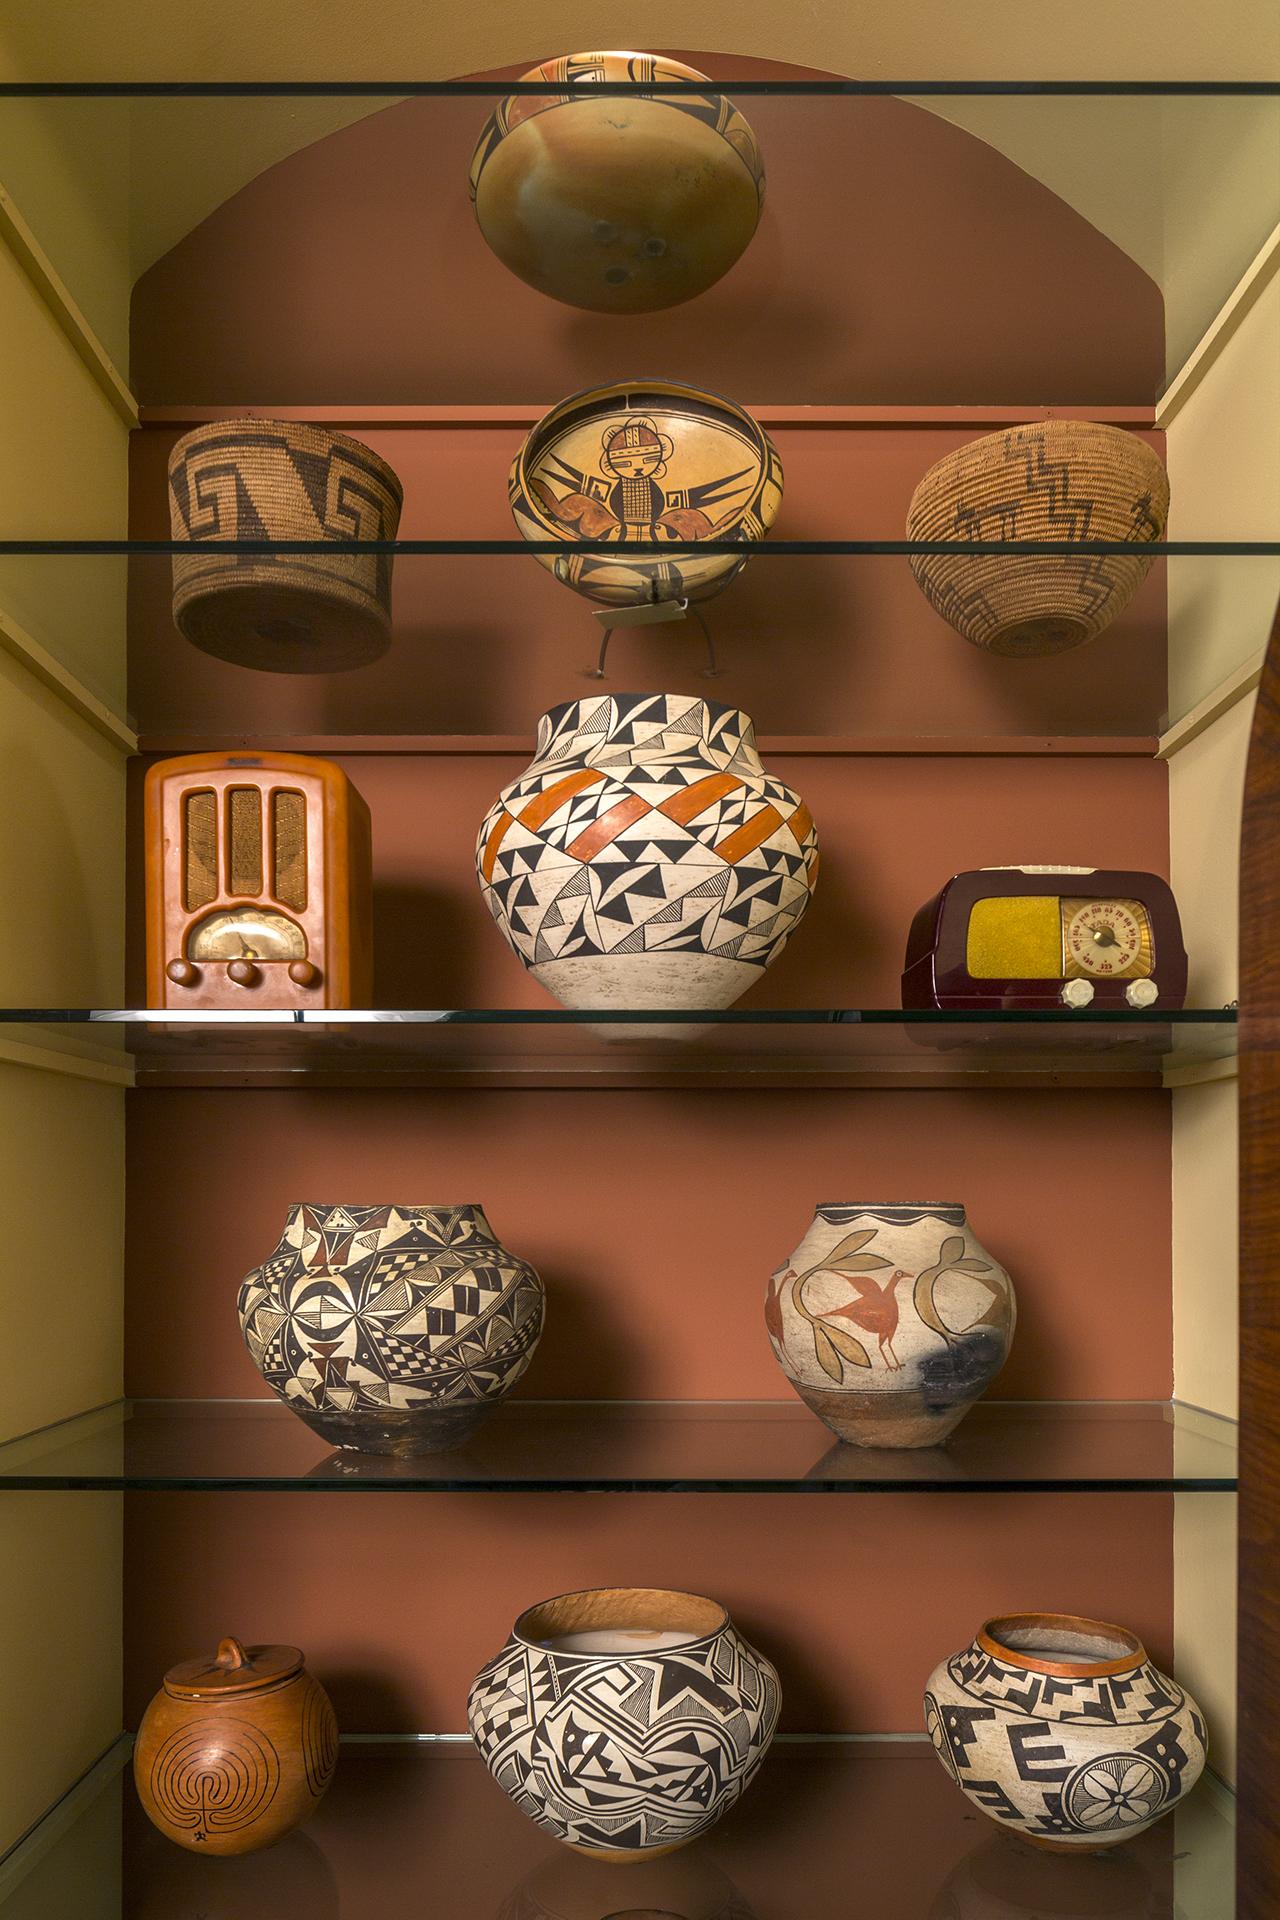 Hilbert-CollectorSeries-2017-045.jpg